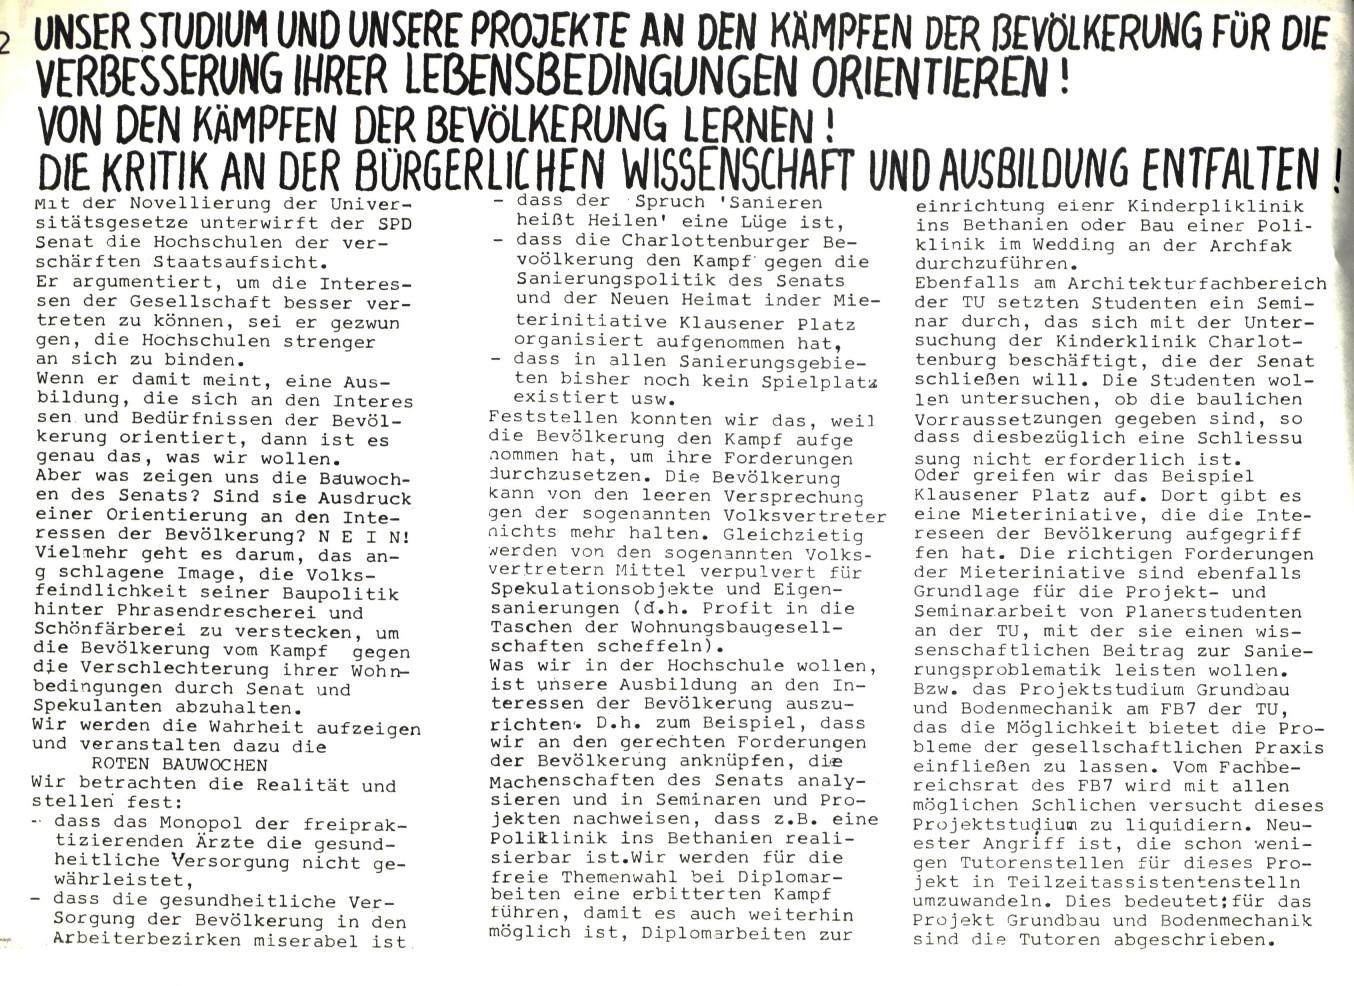 Berlin_KSV_1974_Rote_Bauwochen_07